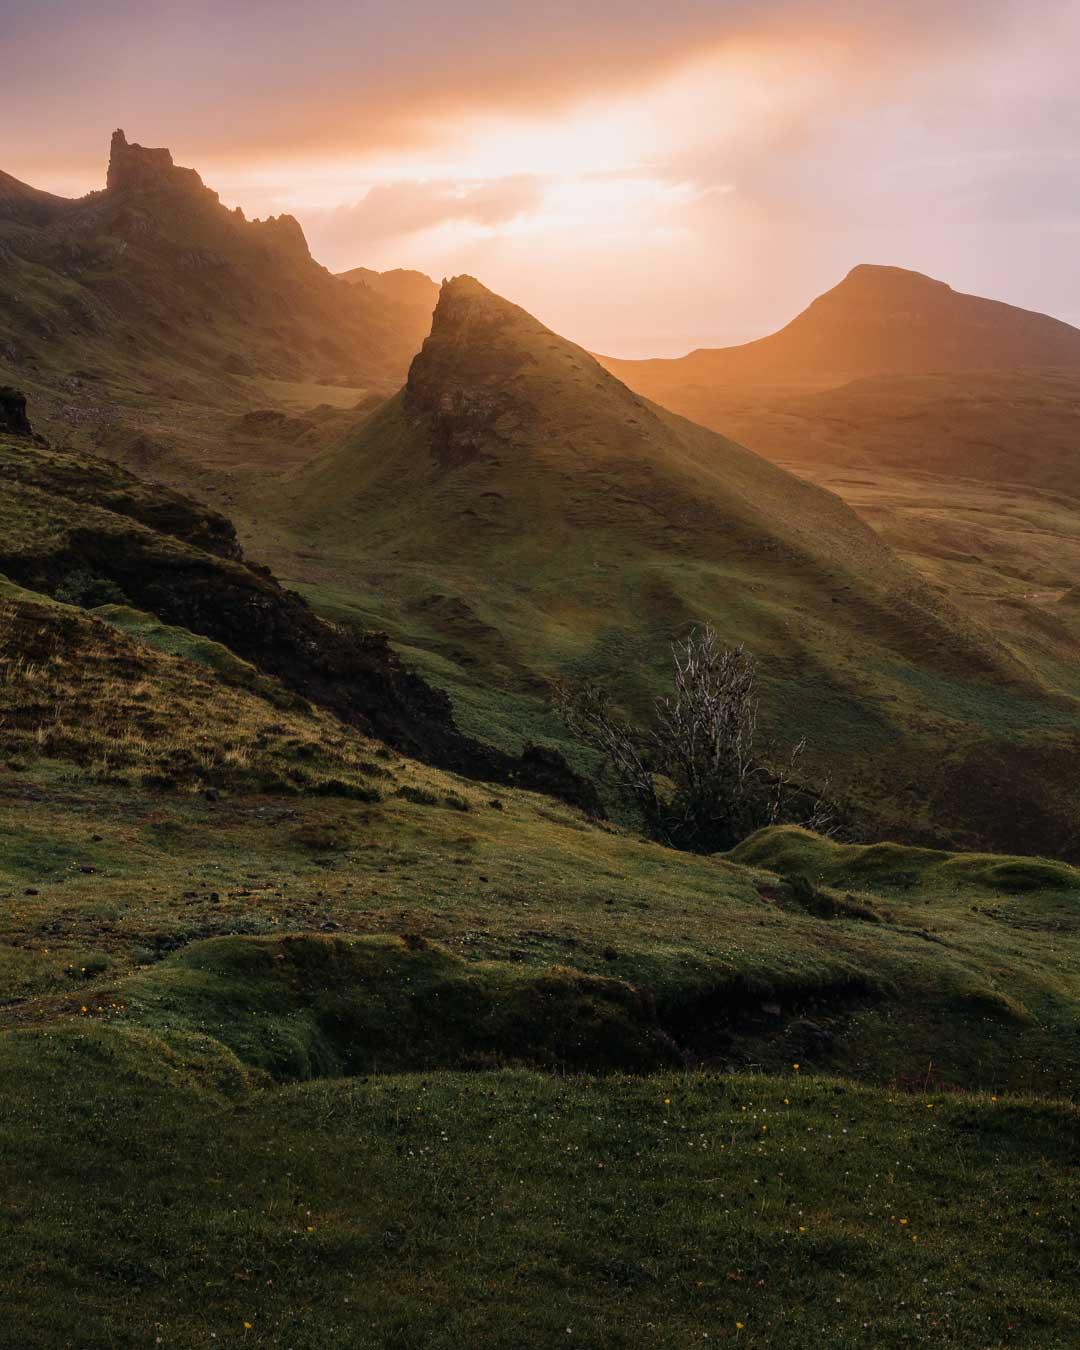 Sunrise at the Quiraing on the Isle of Skye, Scotland